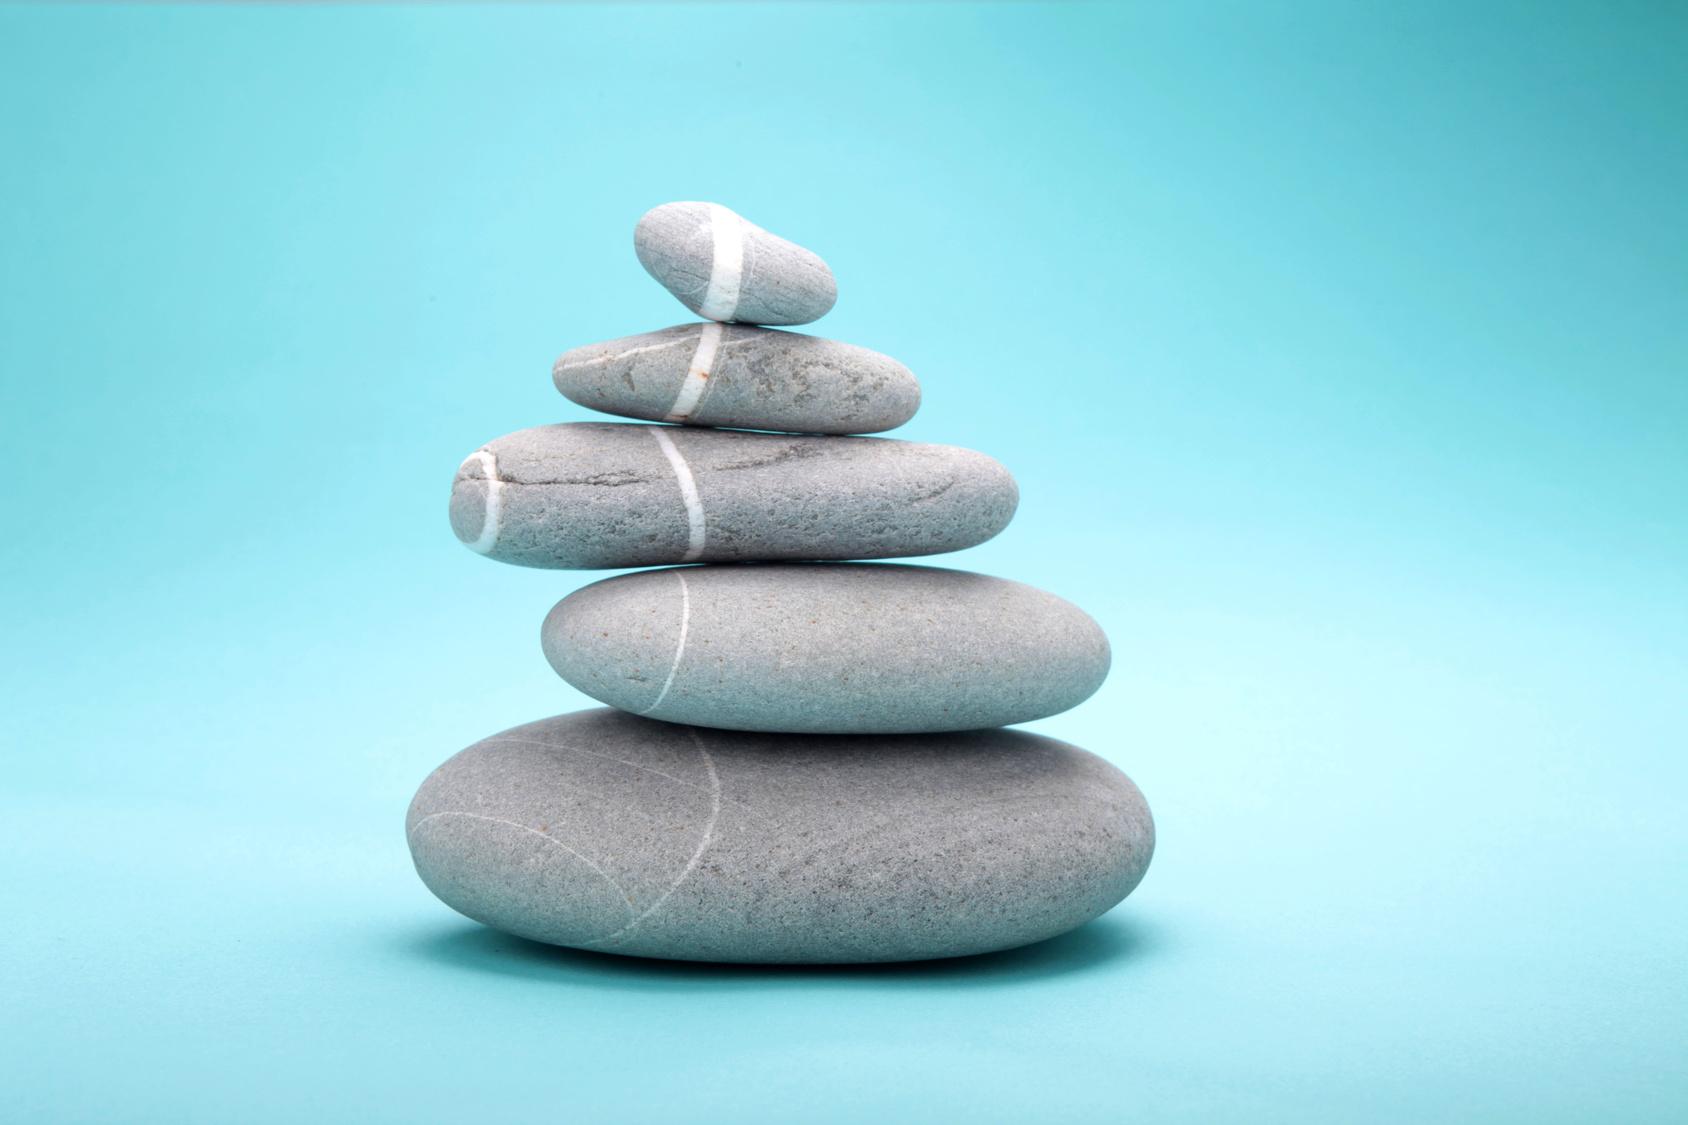 stack of 5 rocks